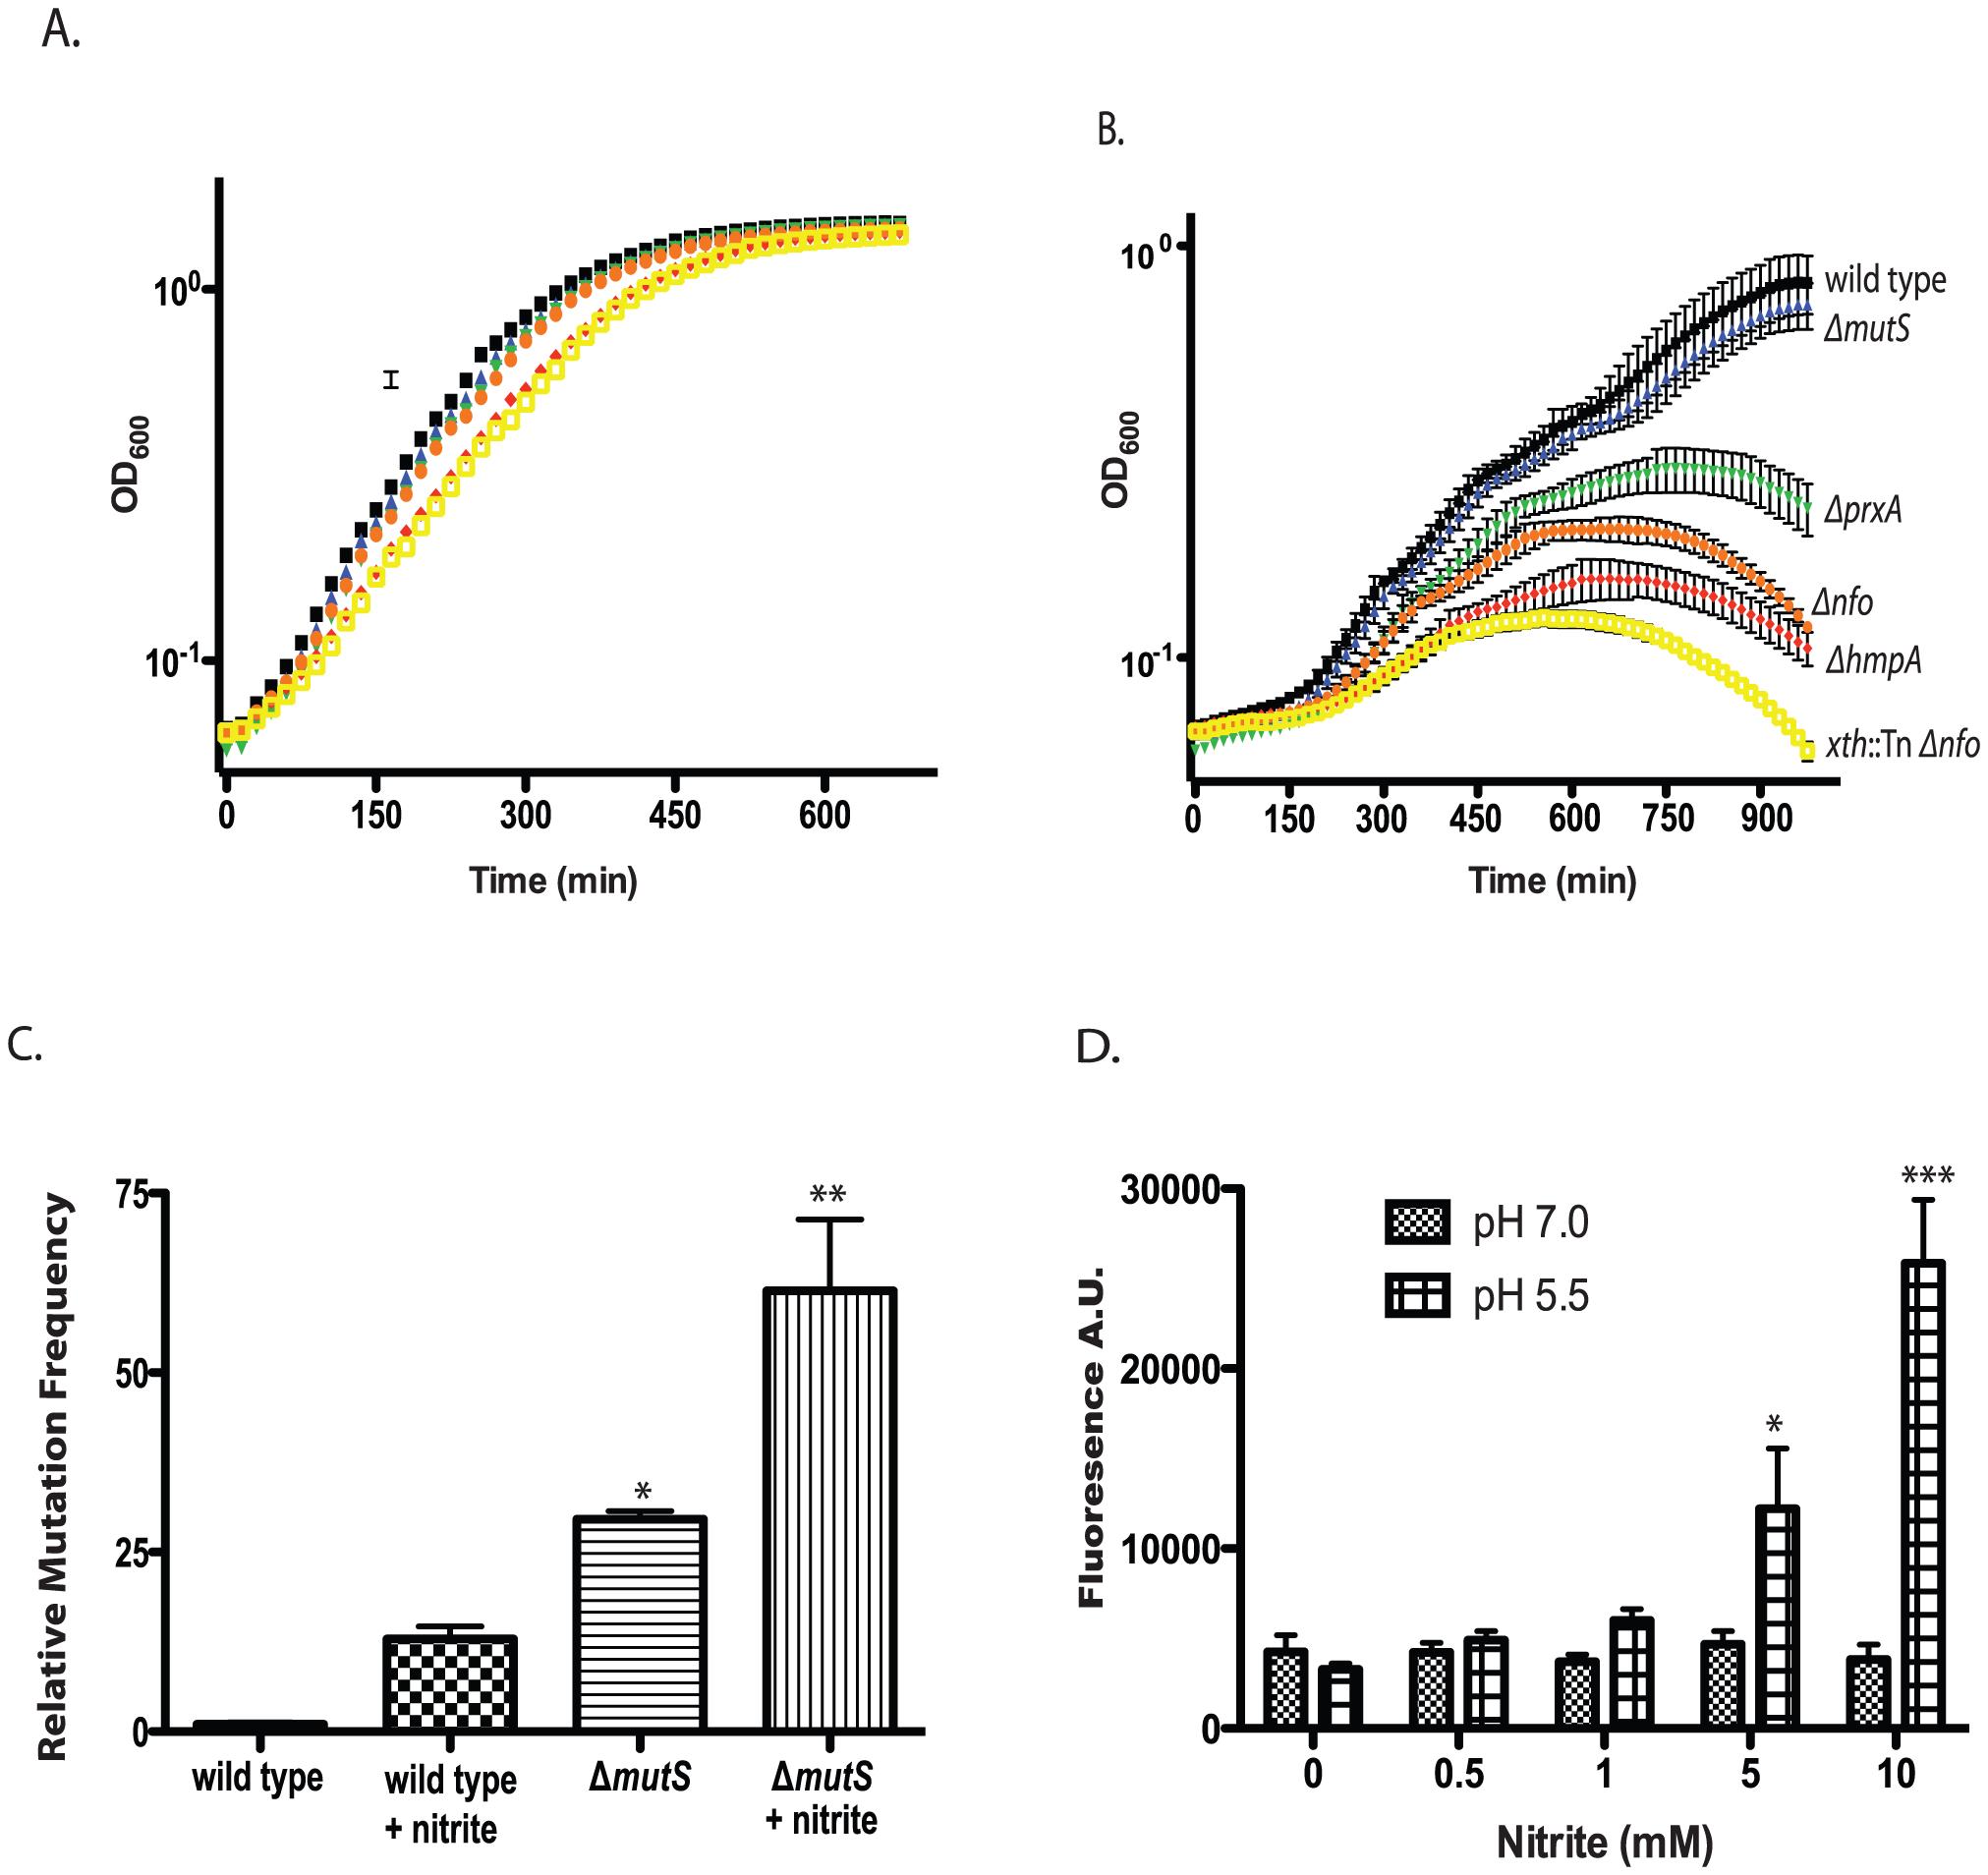 Effect of nitrite on growth of wild type and mutant <i>V. cholerae</i> strains.